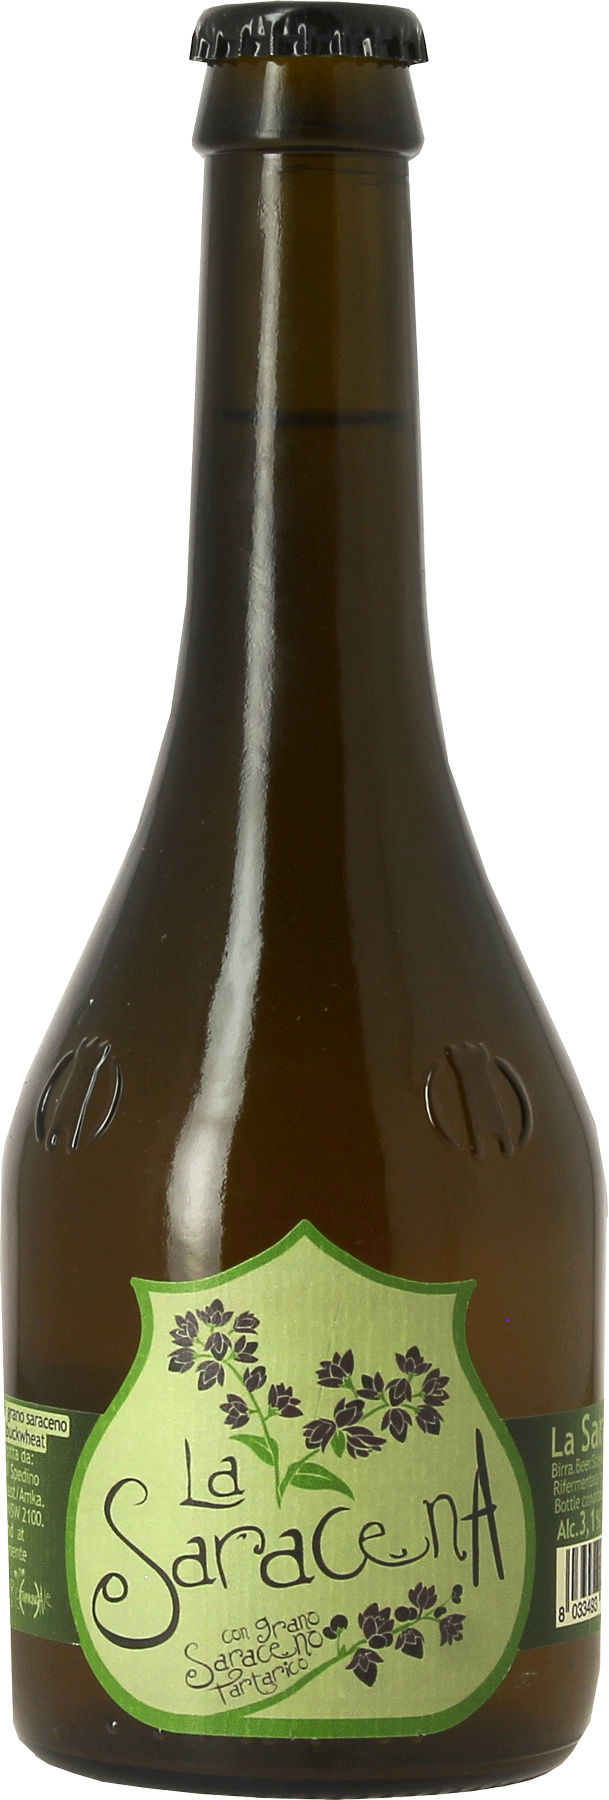 Birra del Borgo - La Saracena